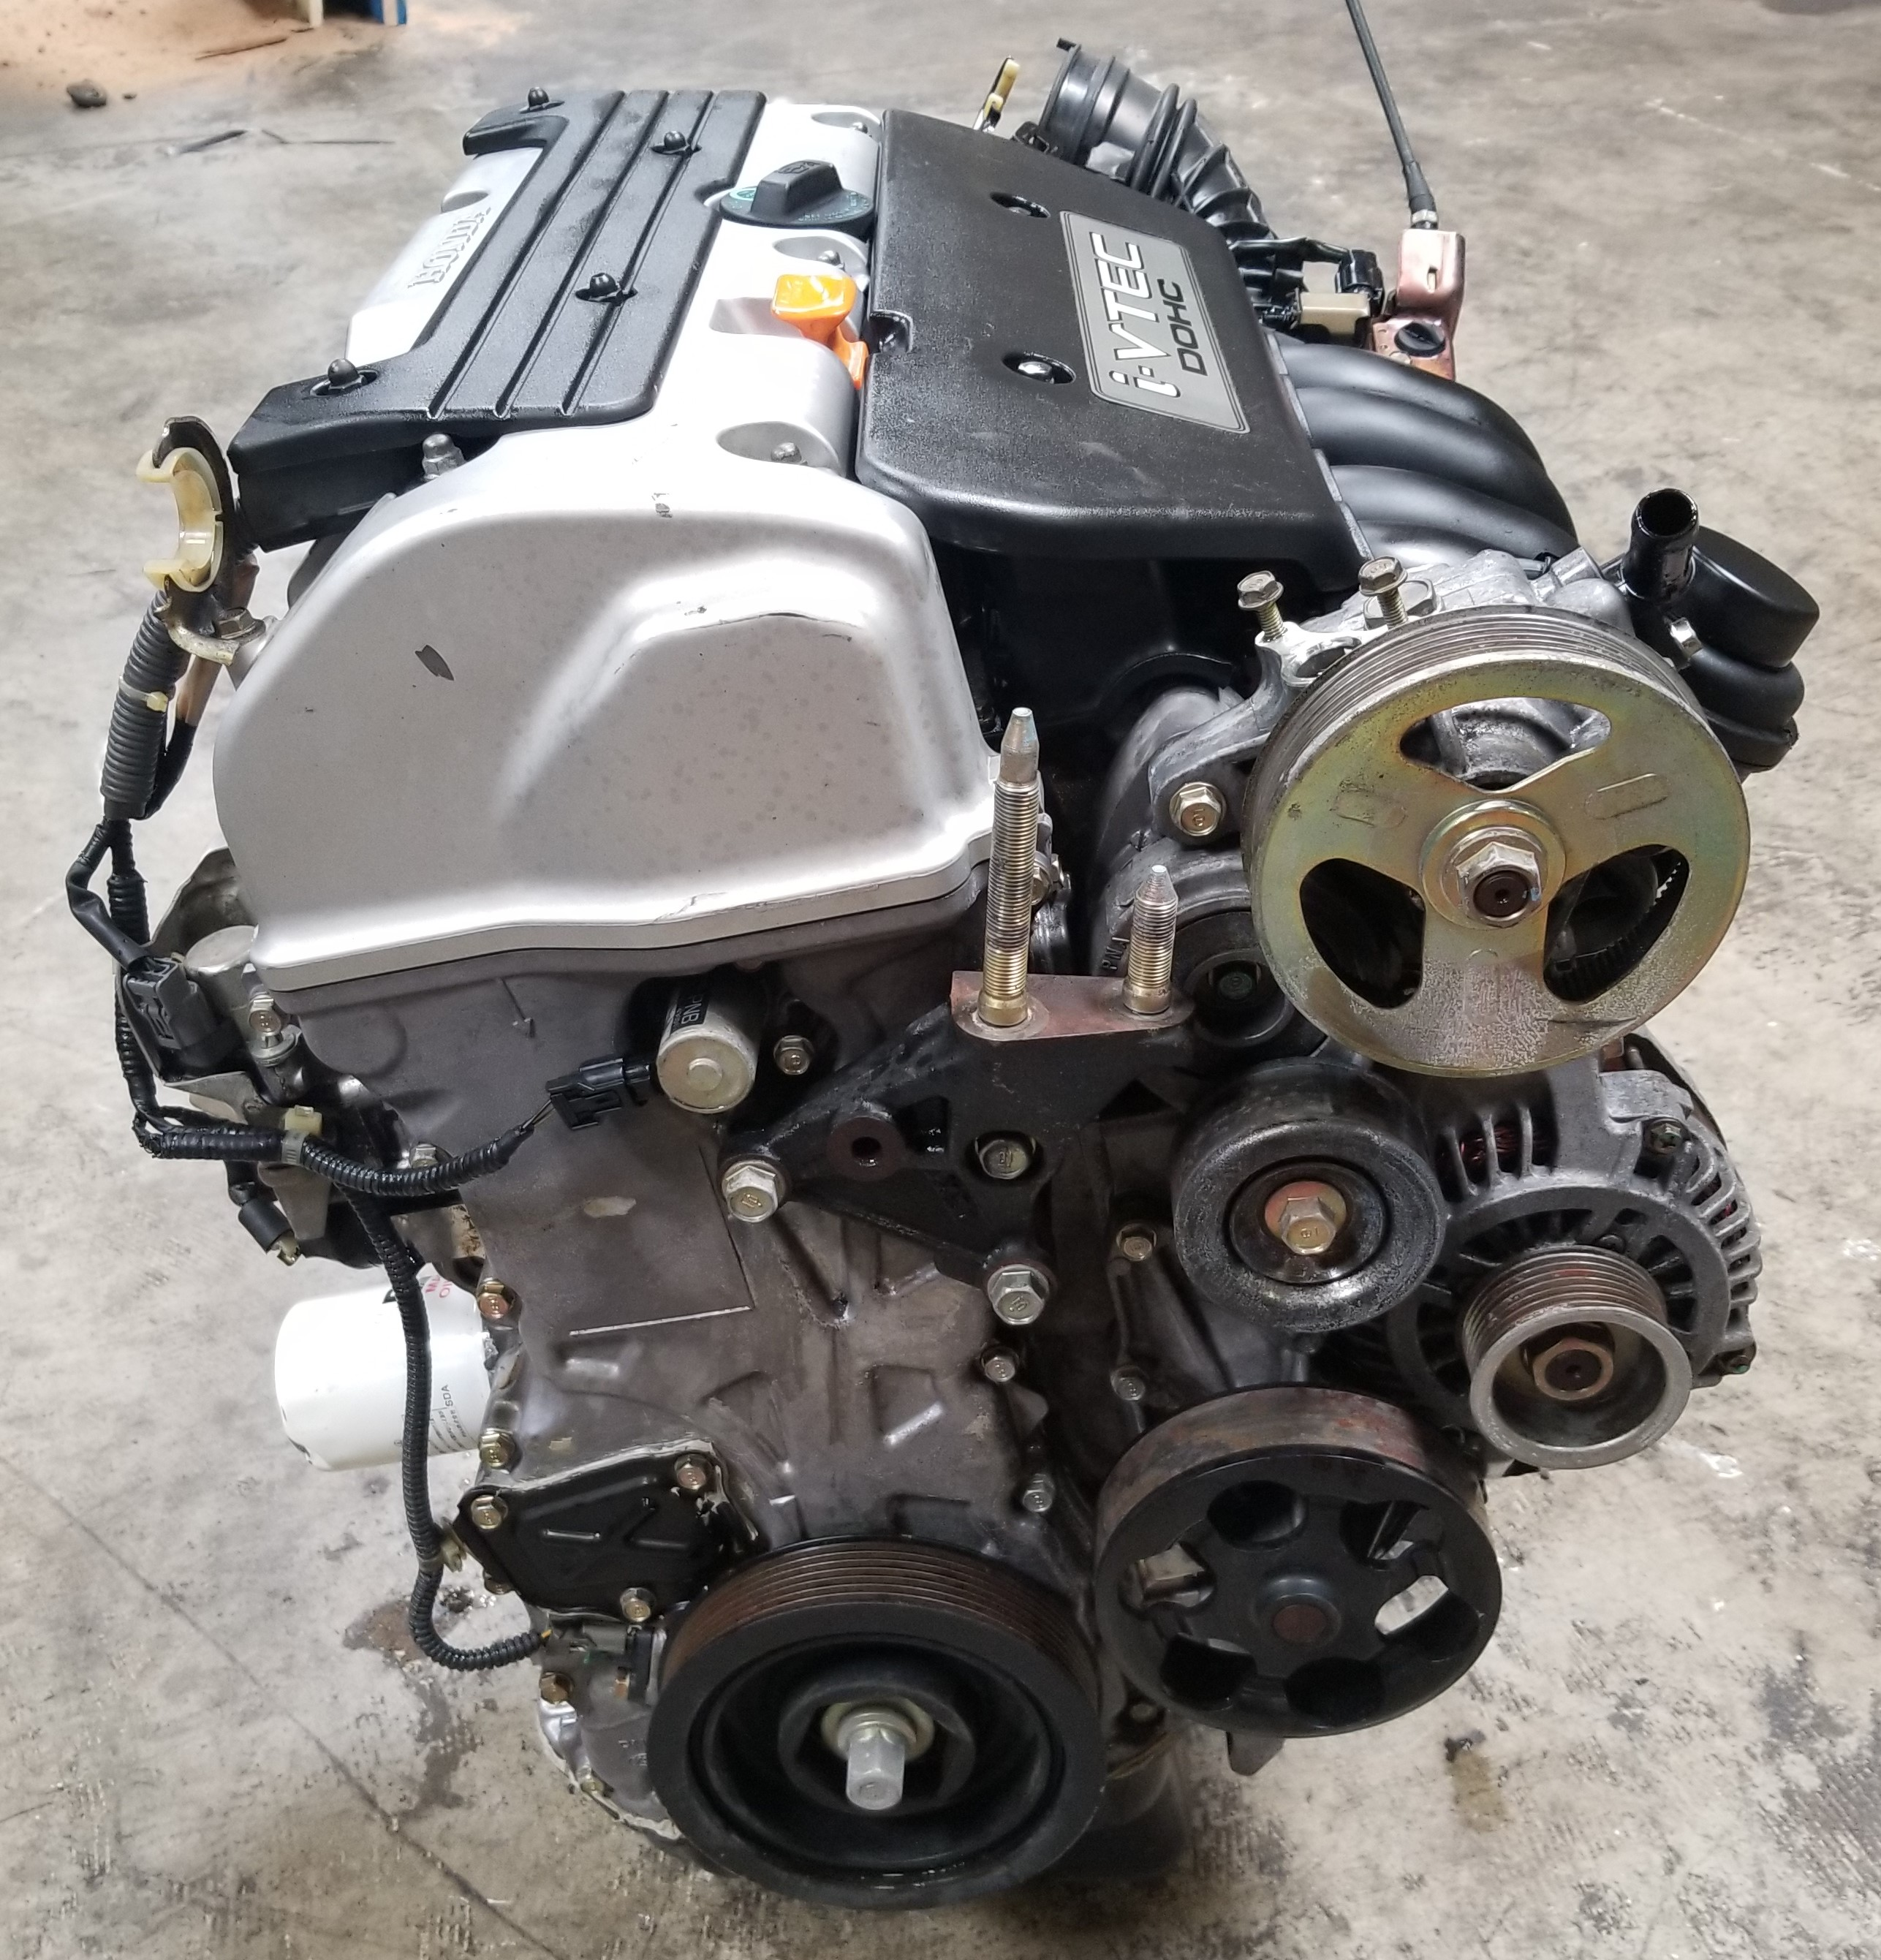 Honda Si For Sale >> K20 2002-2006 ACURA RSX BASE CIVIC SI 2.0 ENGINE JDM K20A ...